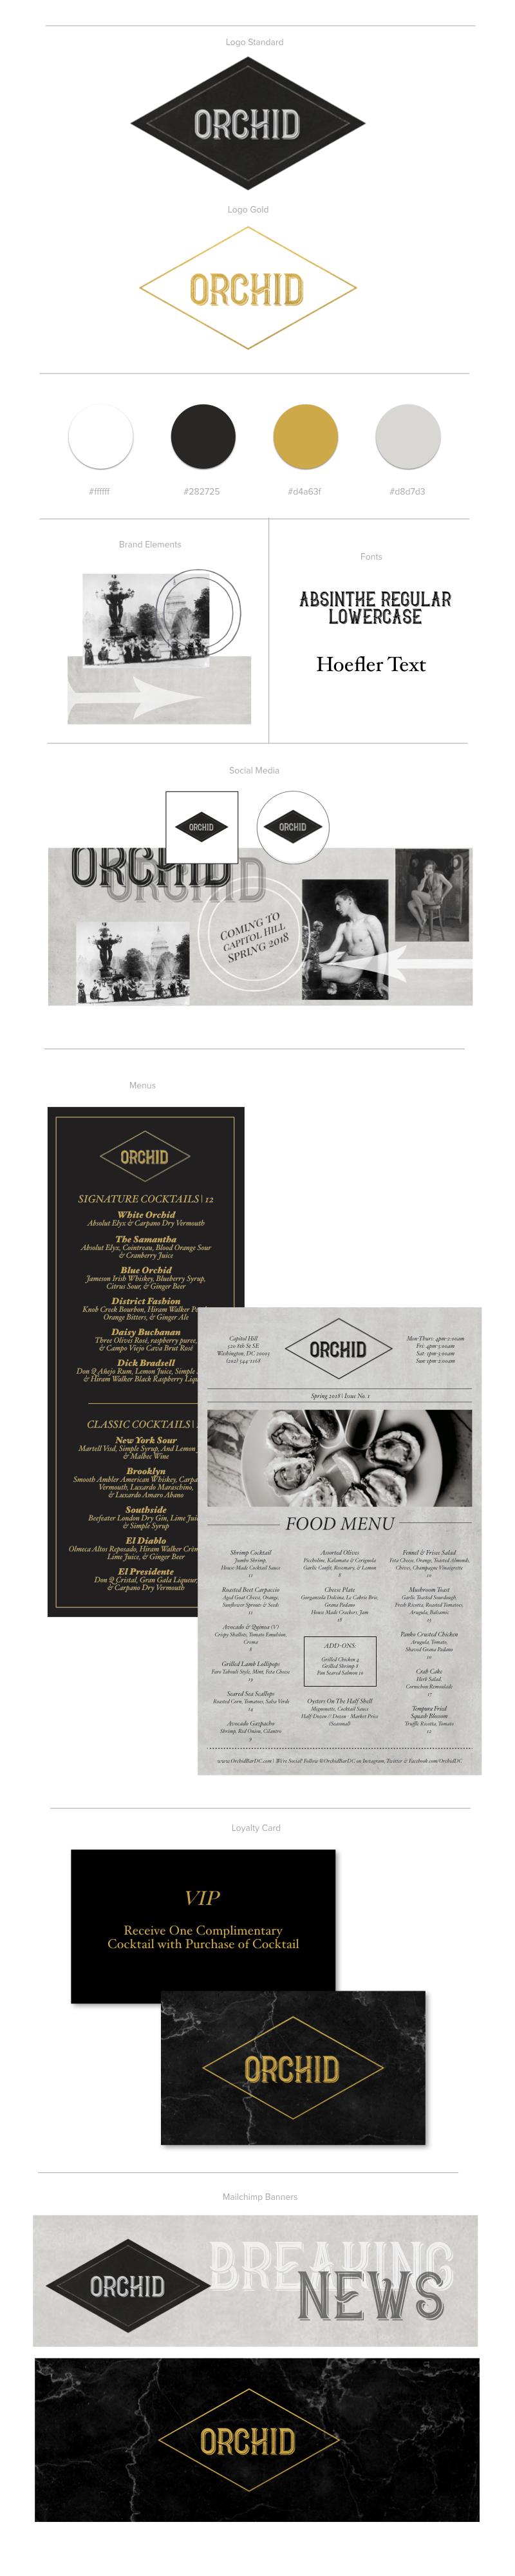 Orchid Branding.001.jpeg